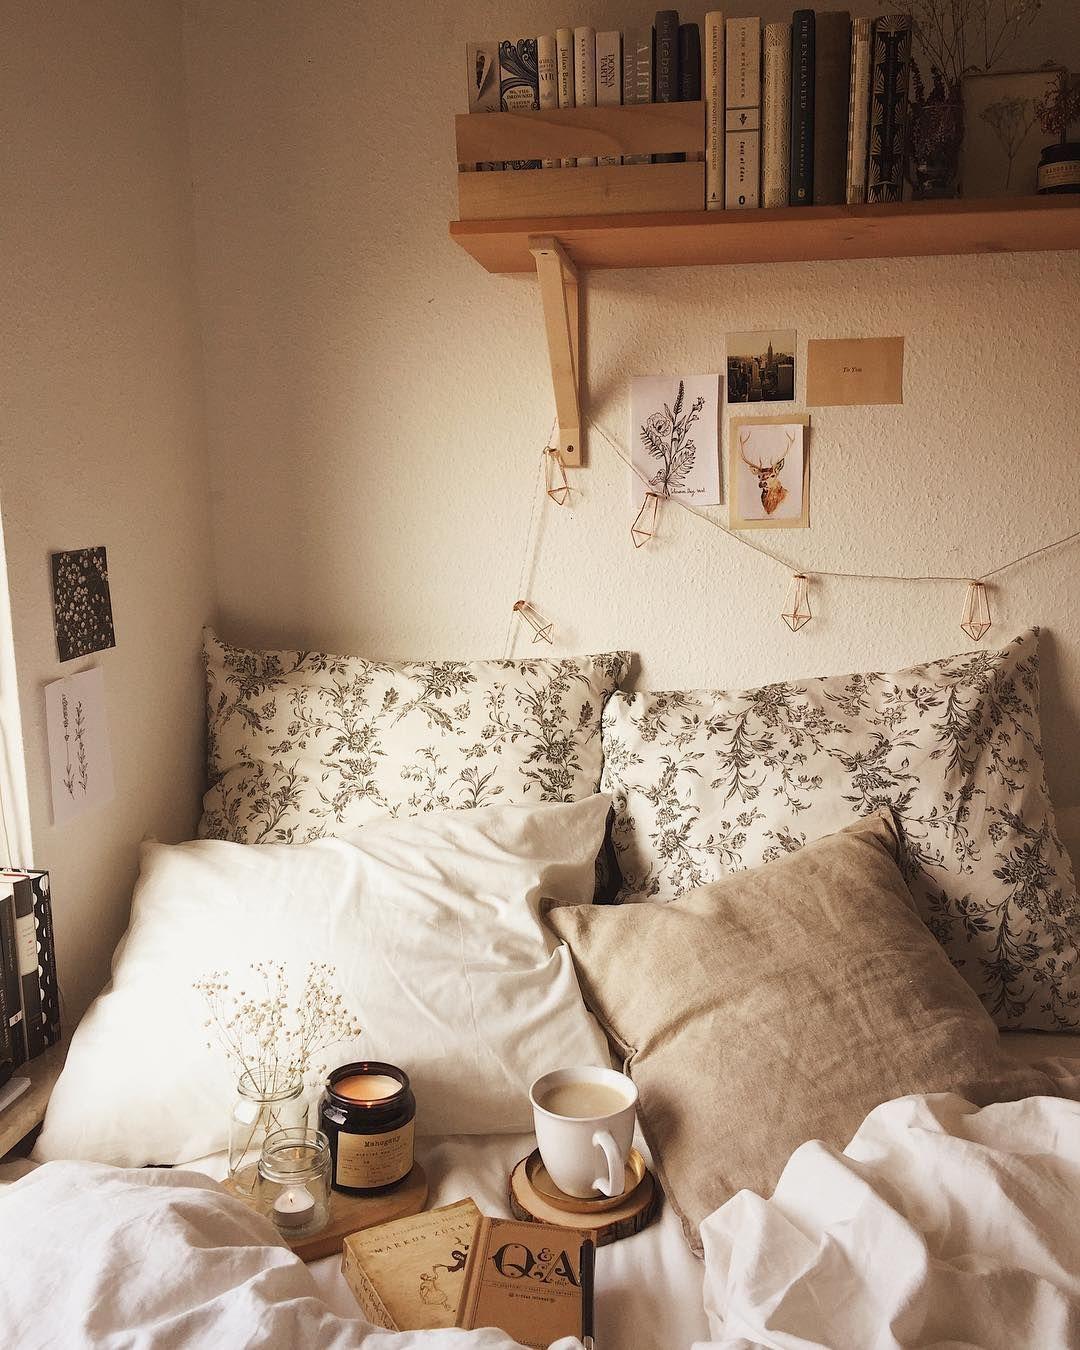 Ein Weiteres Gemutliches Foto Mit Meinem Room Bookstagram Bookworm Booklo Luxury Bedroom Inspiration Home Bedroom Luxurious Bedrooms